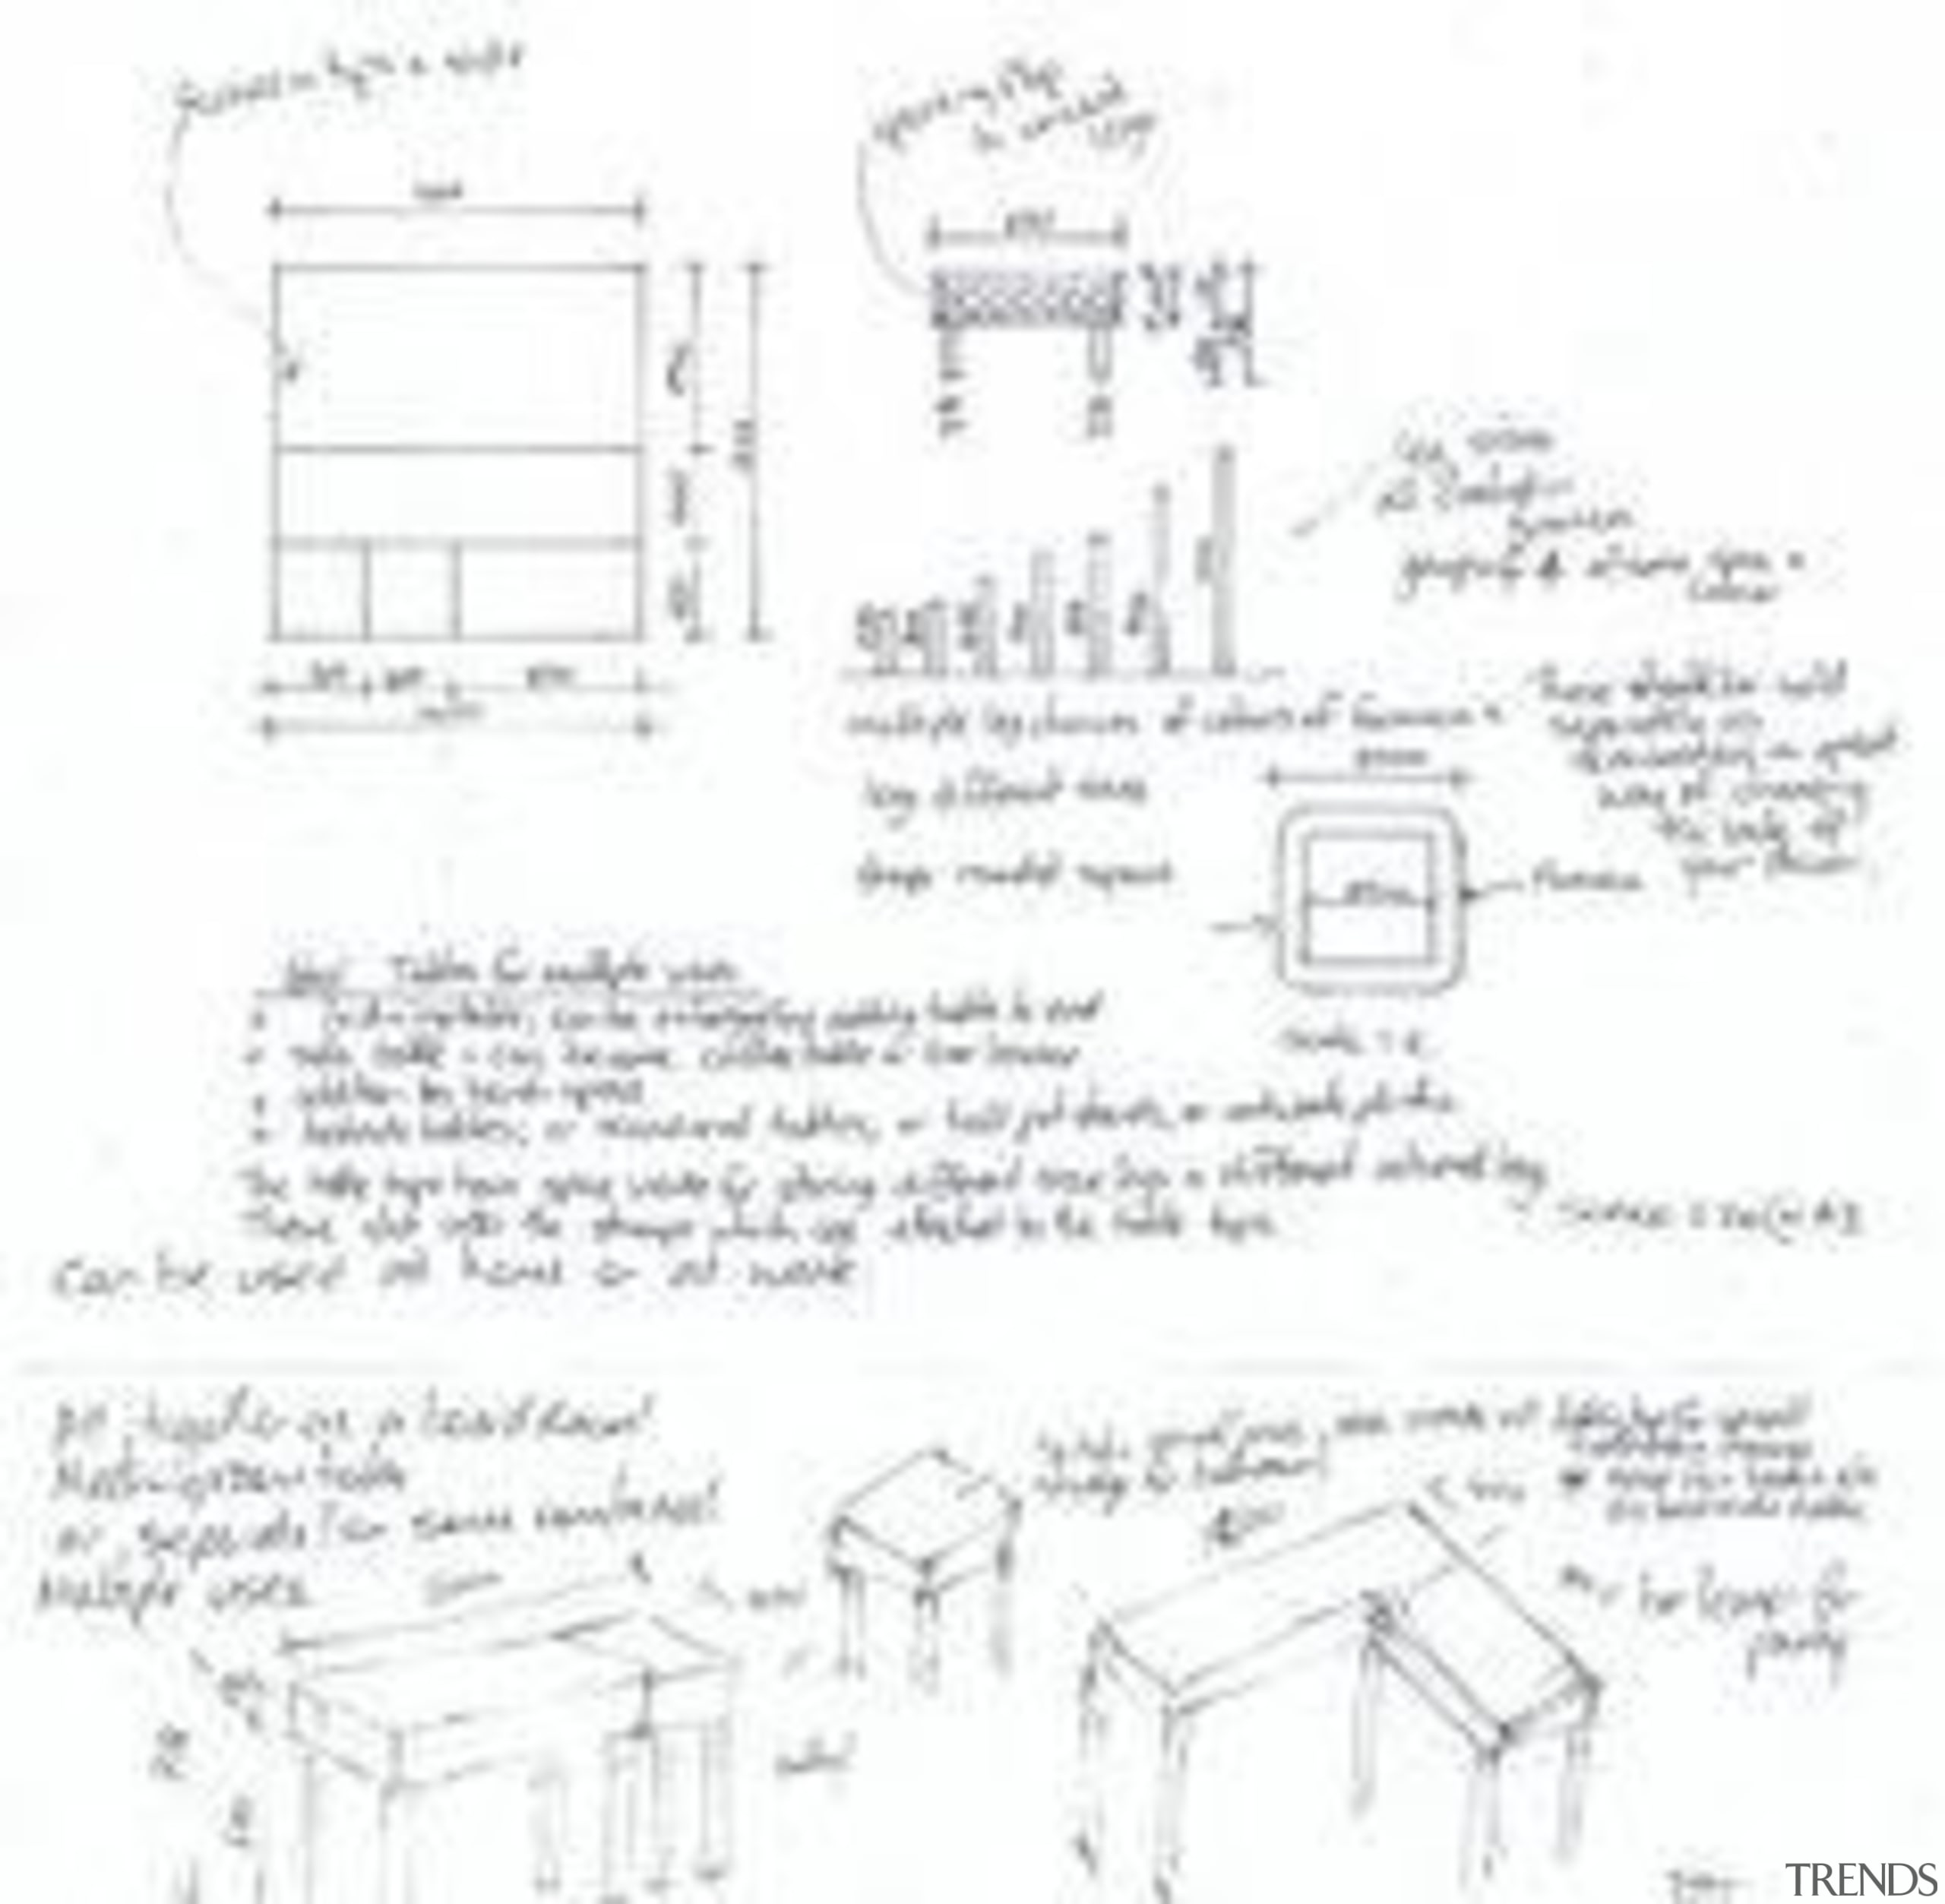 by Debra De Lorenzo - by Debra De area, artwork, black and white, design, diagram, drawing, font, line, line art, paper, plan, product, product design, sketch, structure, text, white